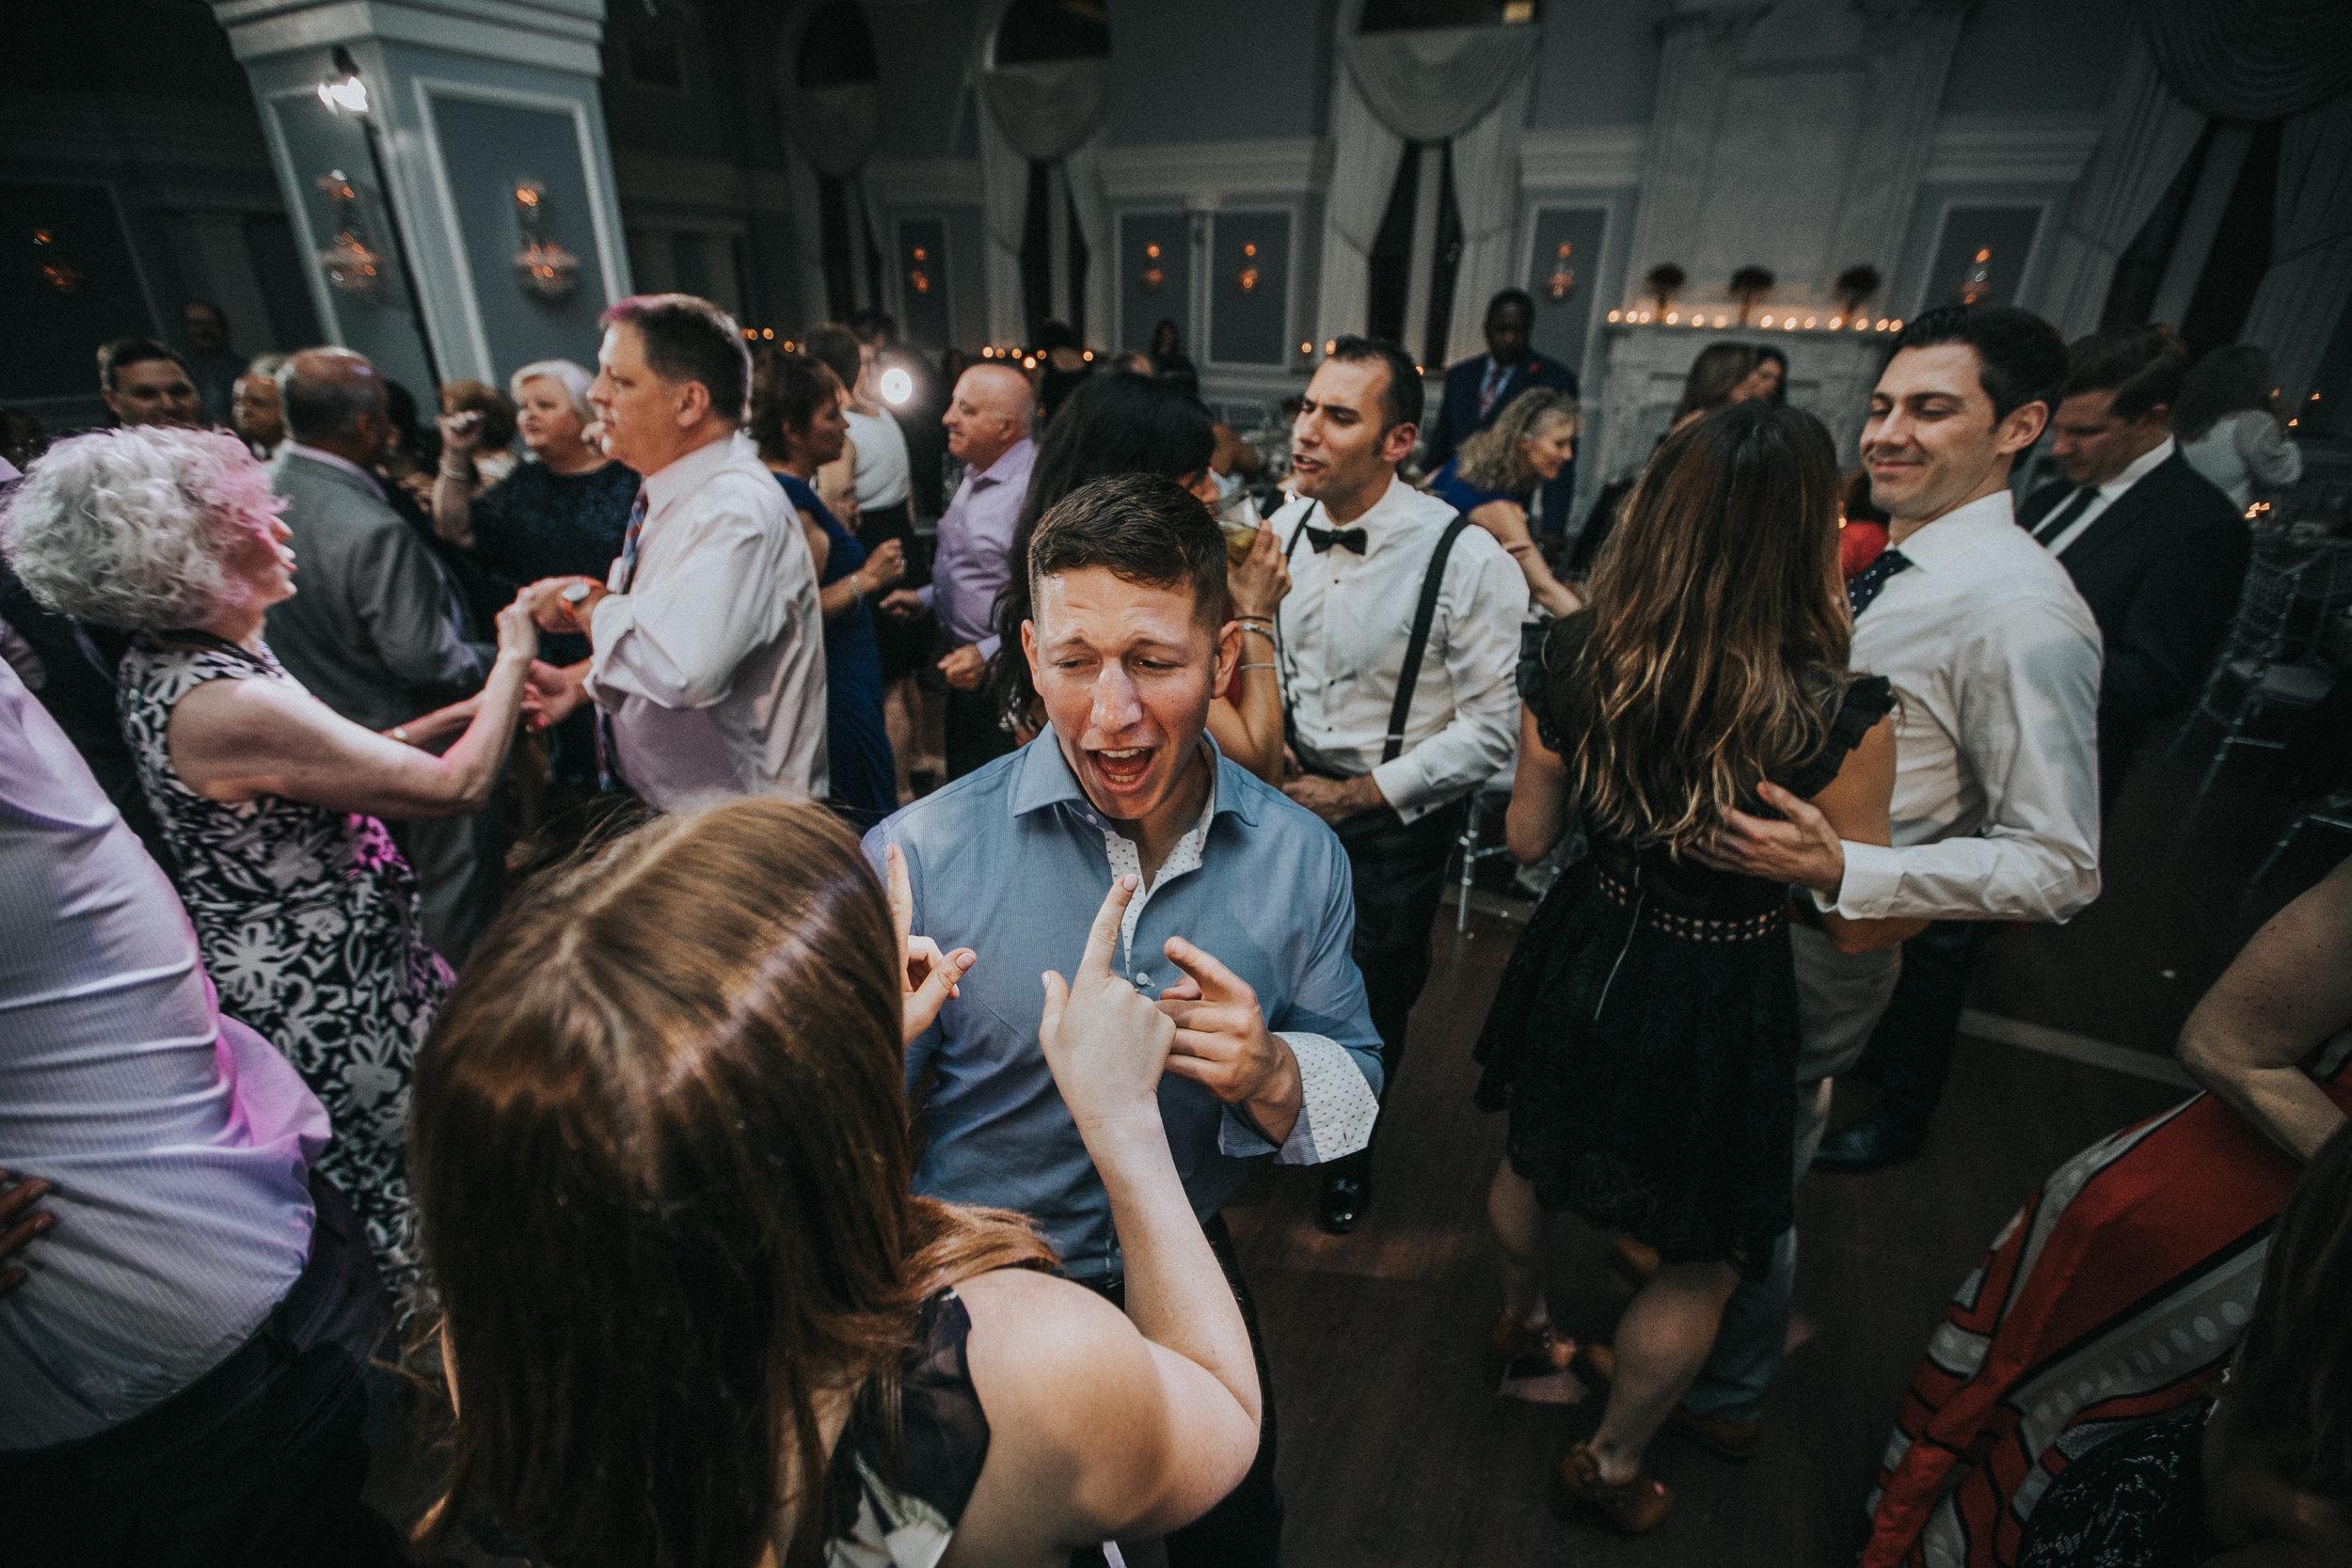 JennaLynnPhotography-NJWeddingPhotographer-Philadelphia-Wedding-ArtsBallroom-Reception-184.jpg